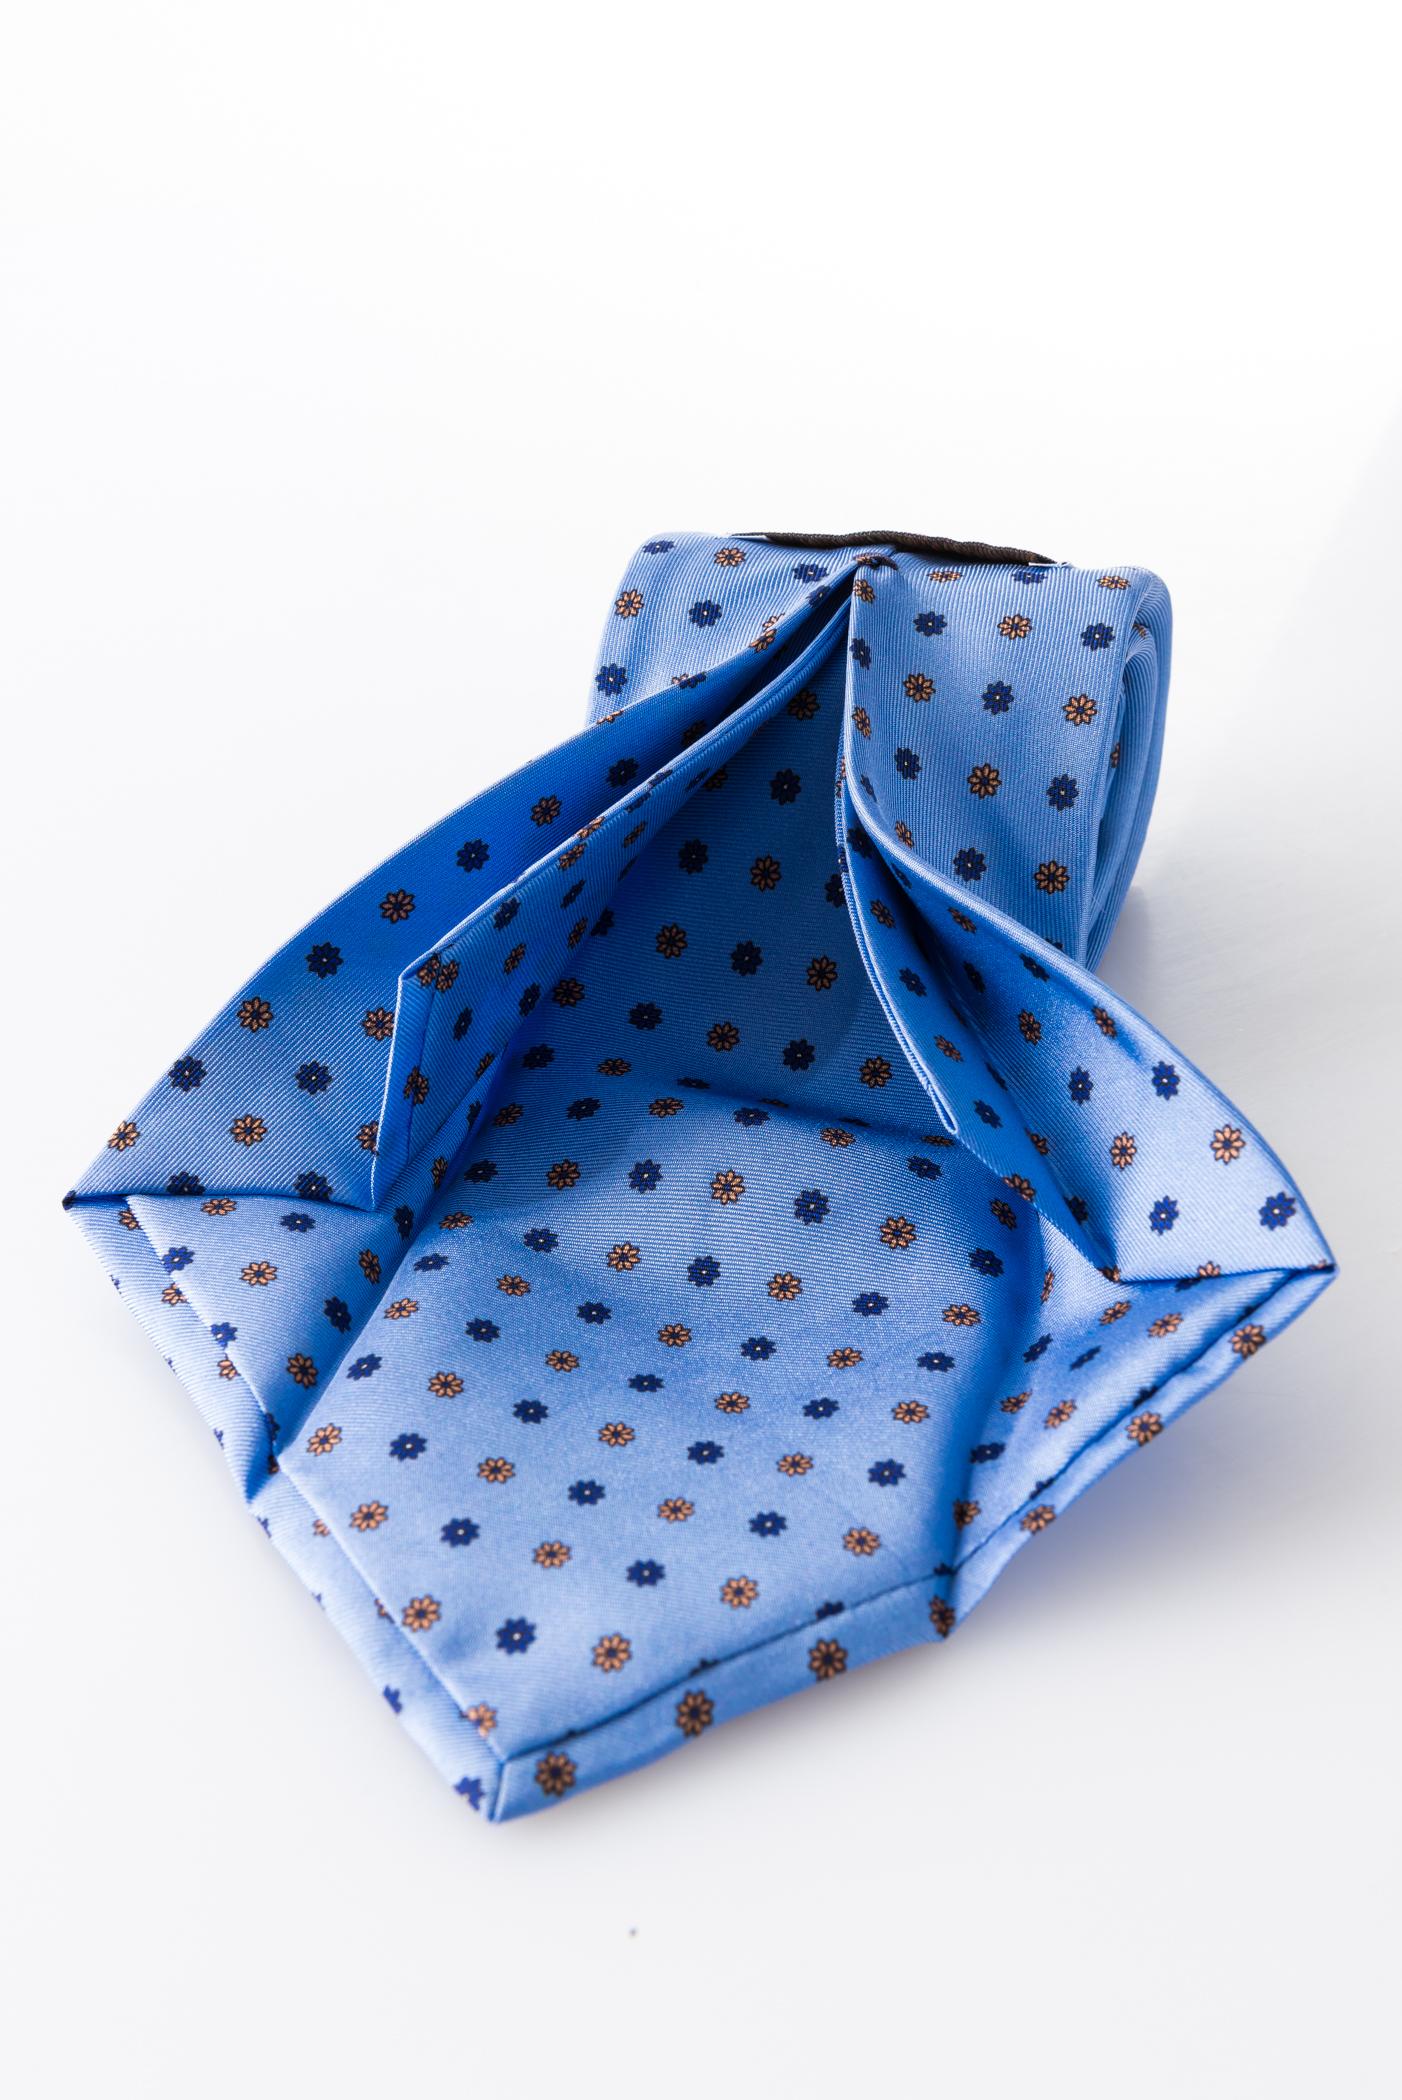 Seven-fold Tie -Margherita Celeste – seven-fold detail